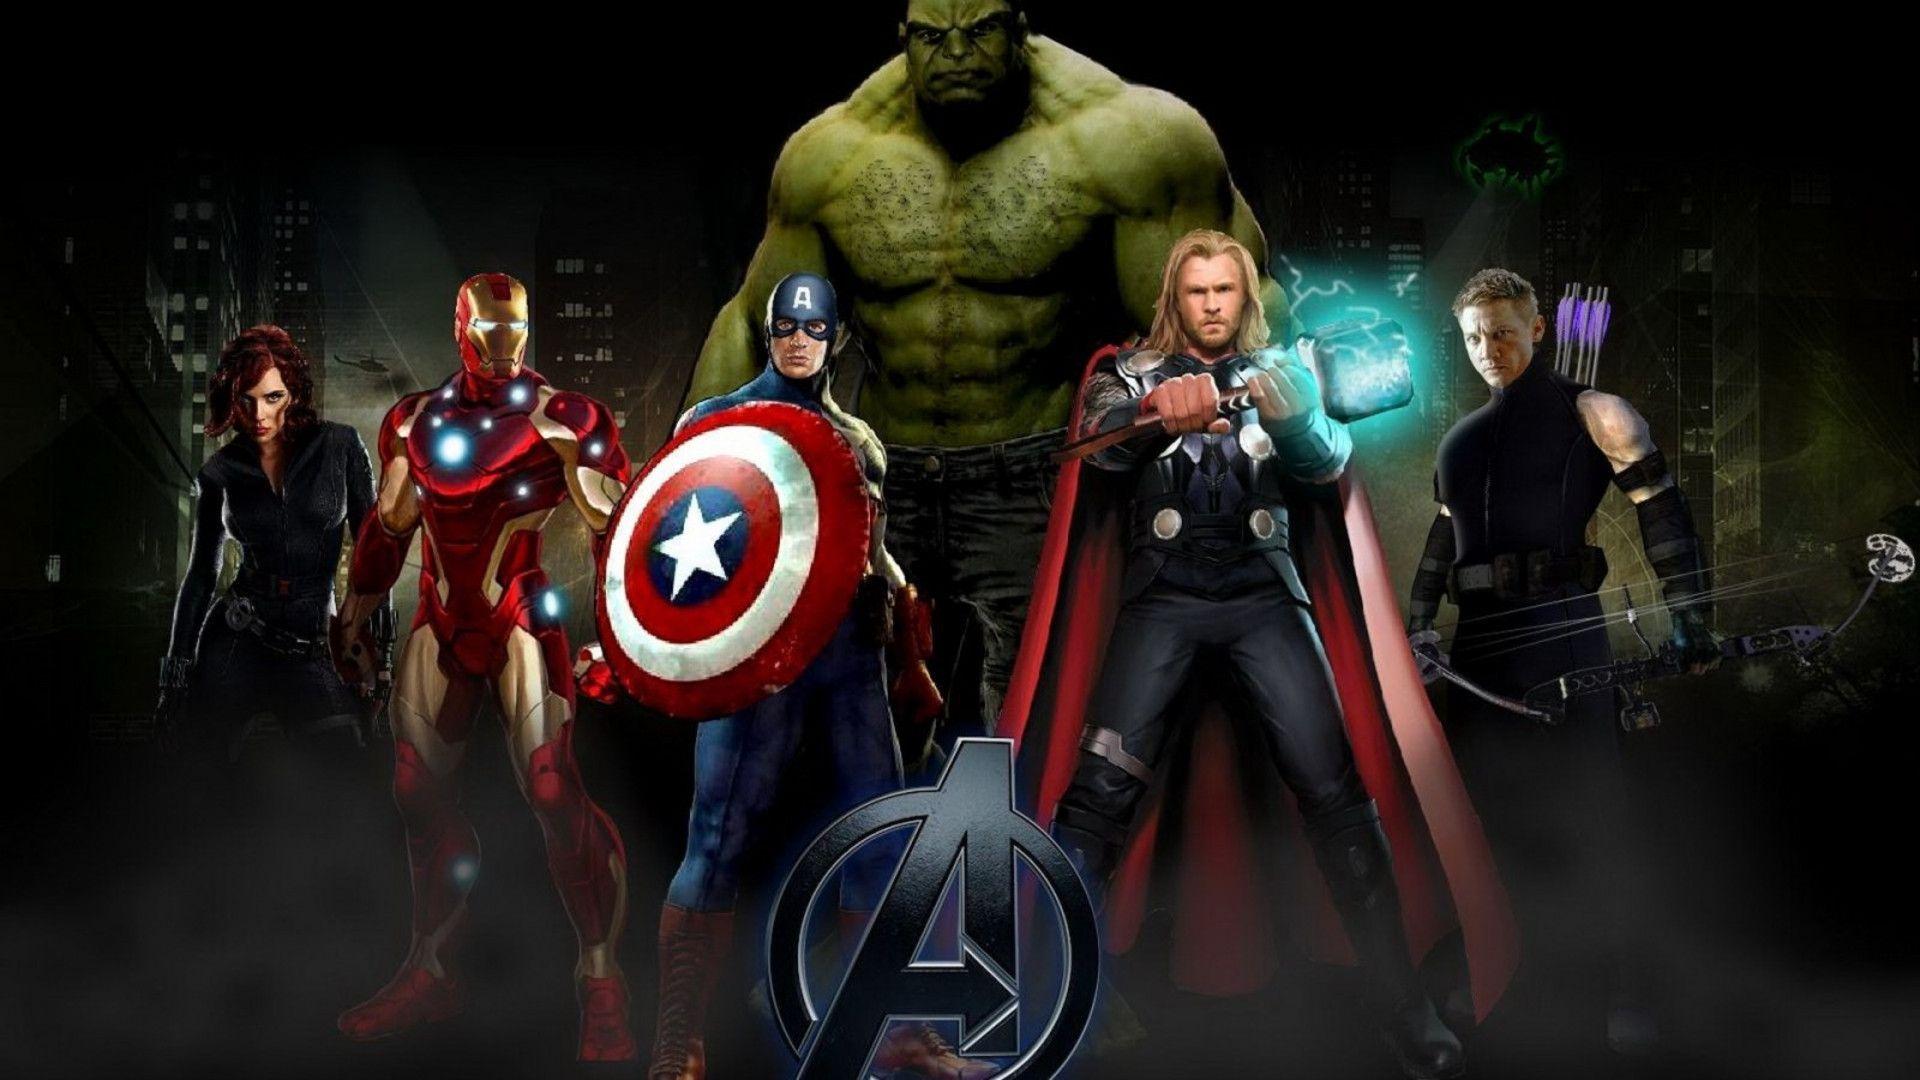 Avengers Assemble 2016 Hd Wallpapers